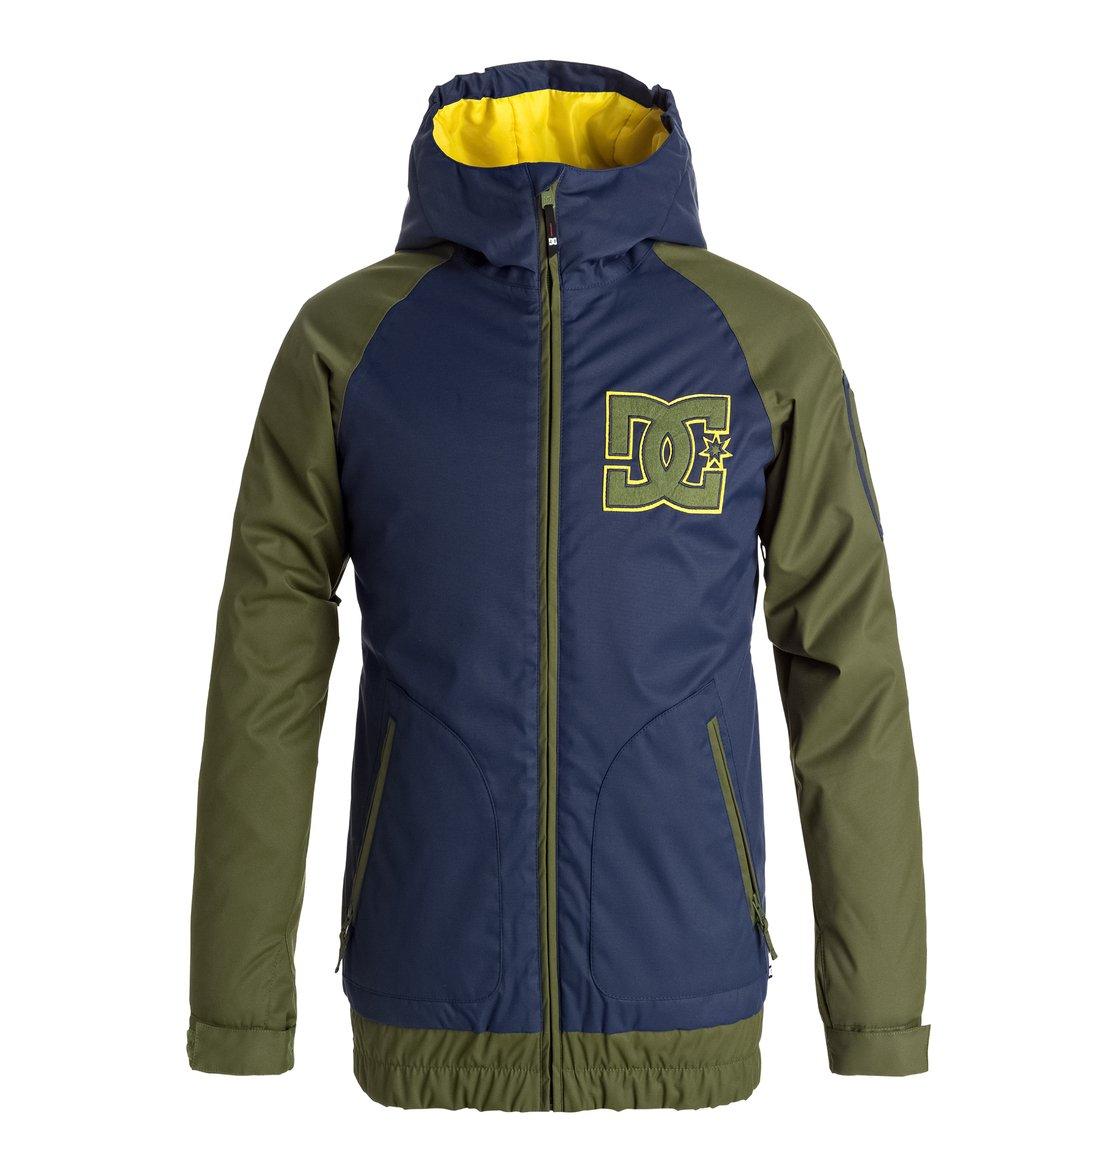 3a6642a5a Troop - Snow Jacket for Boys 8-16 EDBTJ03019